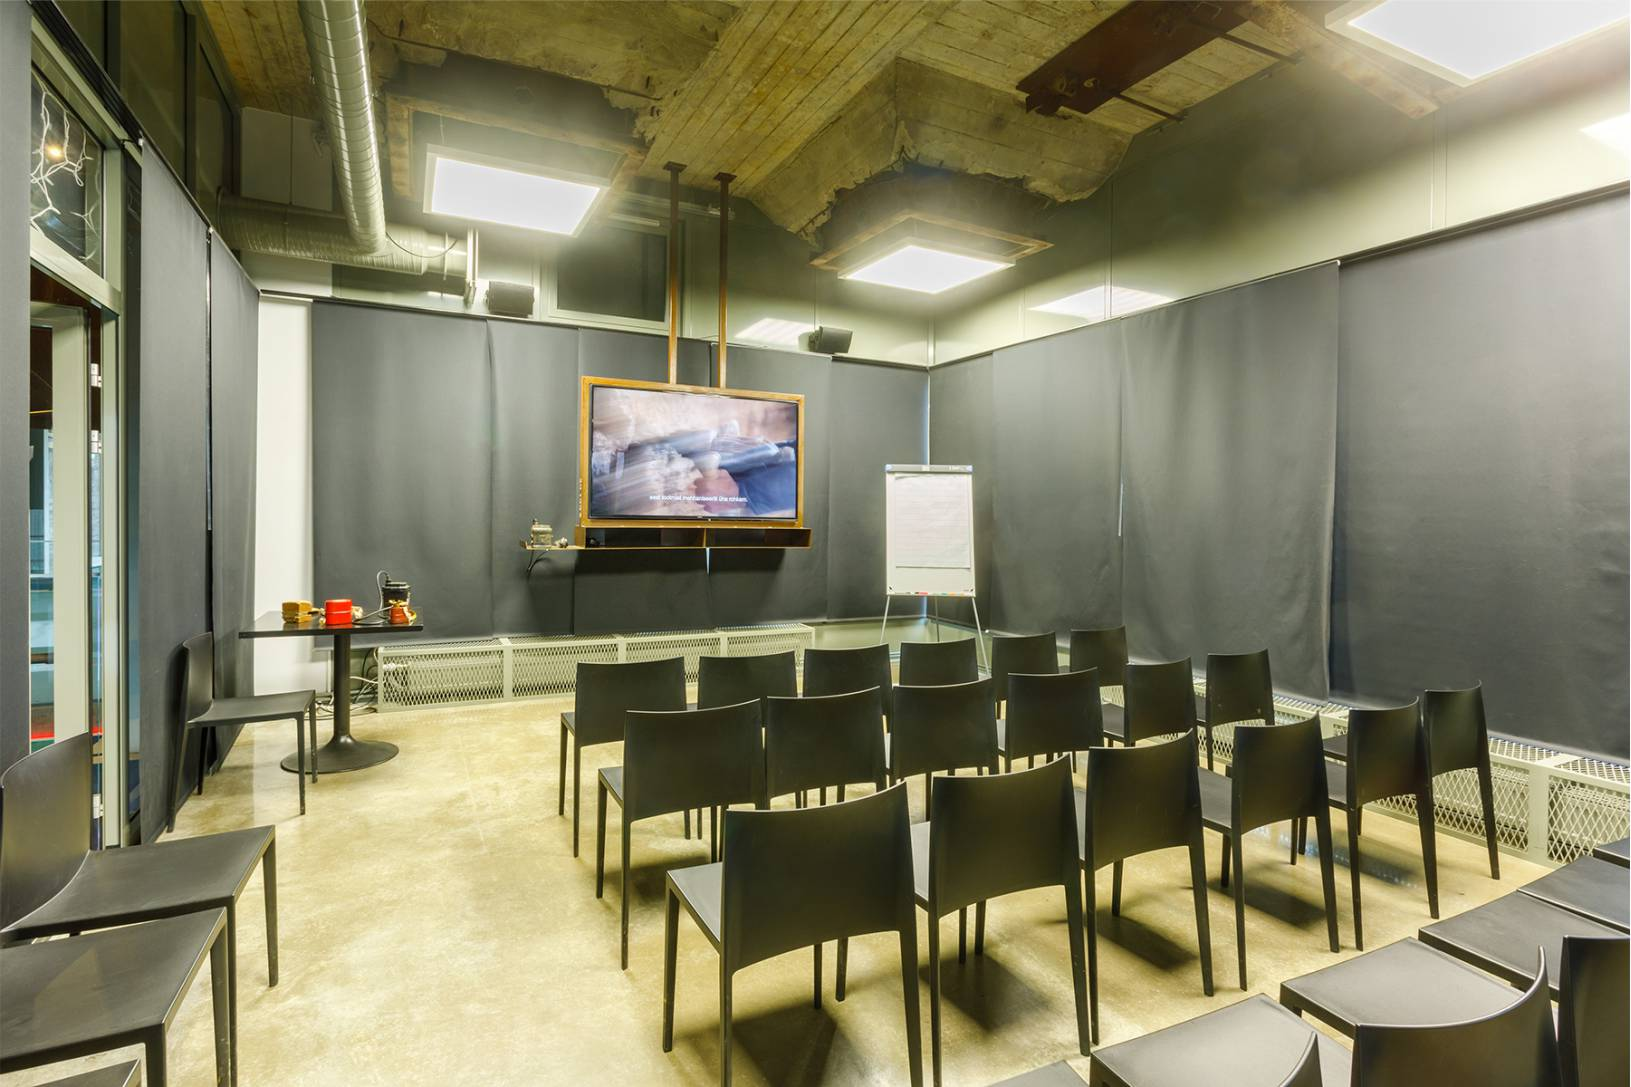 Rikastusvabriku seminariruum